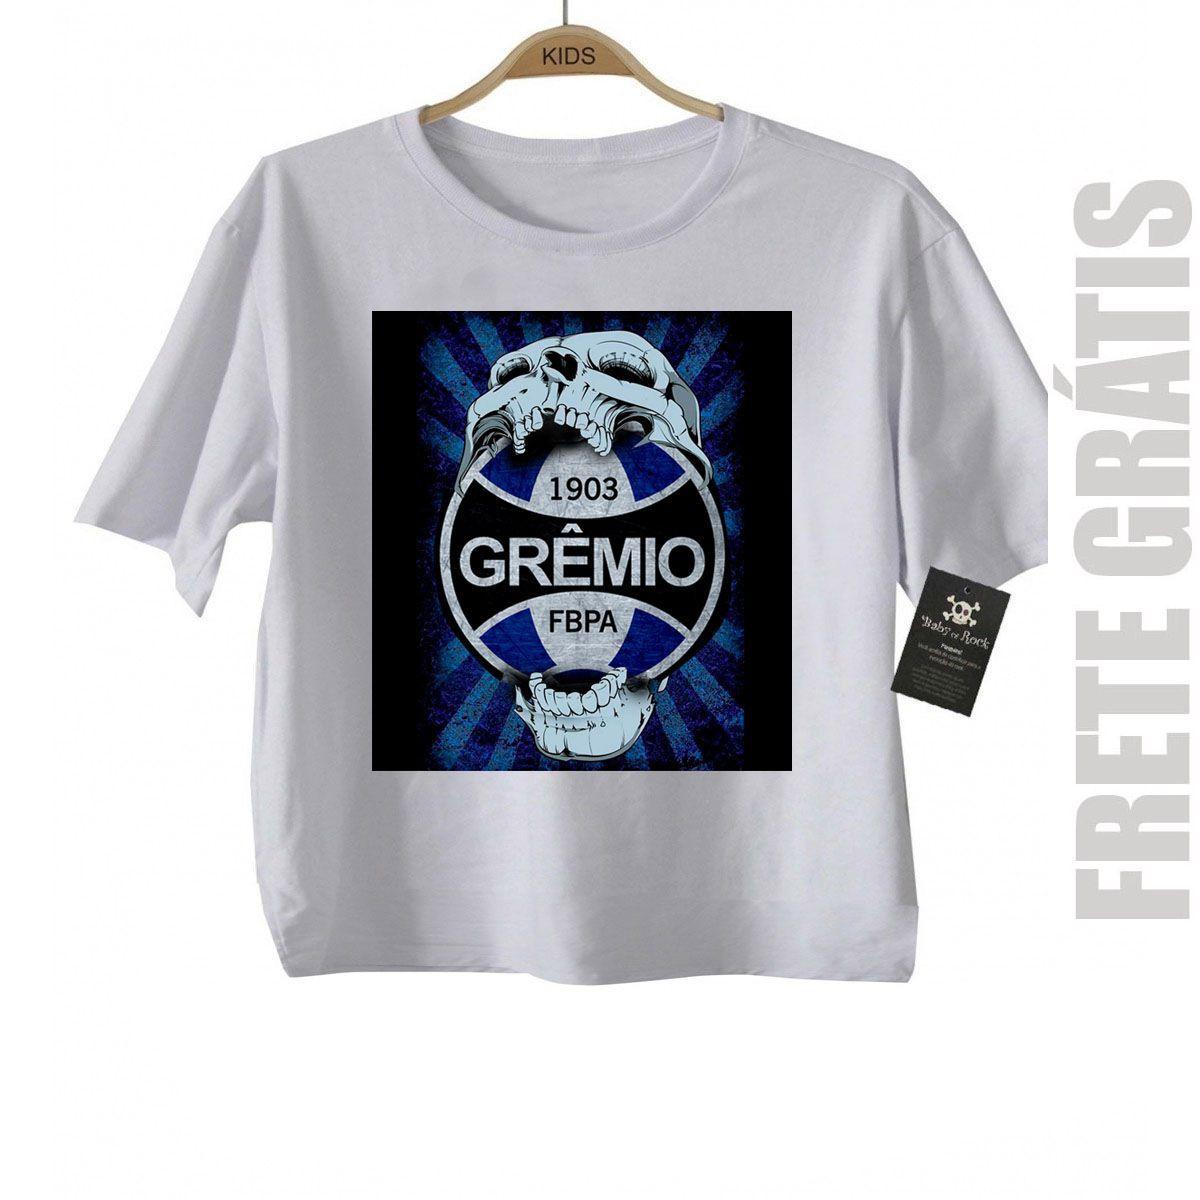 Camiseta Infantil  Gremio Futebol Time - White  - Baby Monster S/A